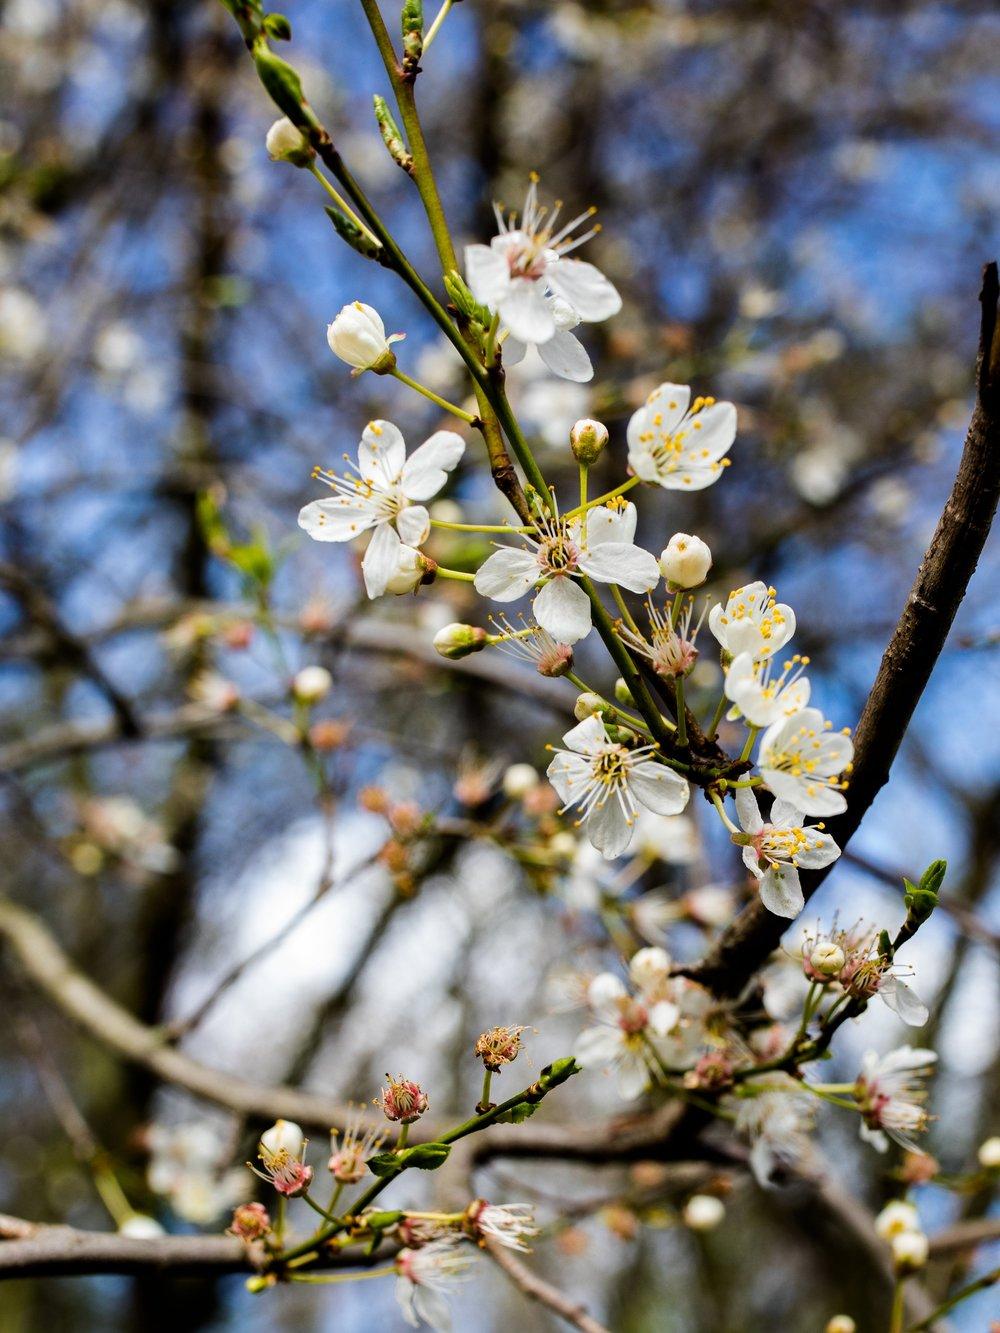 Amsterdam+Vondelpark+Spring+Cherry+Blossoms+2019+%C2%A9+Lily+Heaton-24.jpg